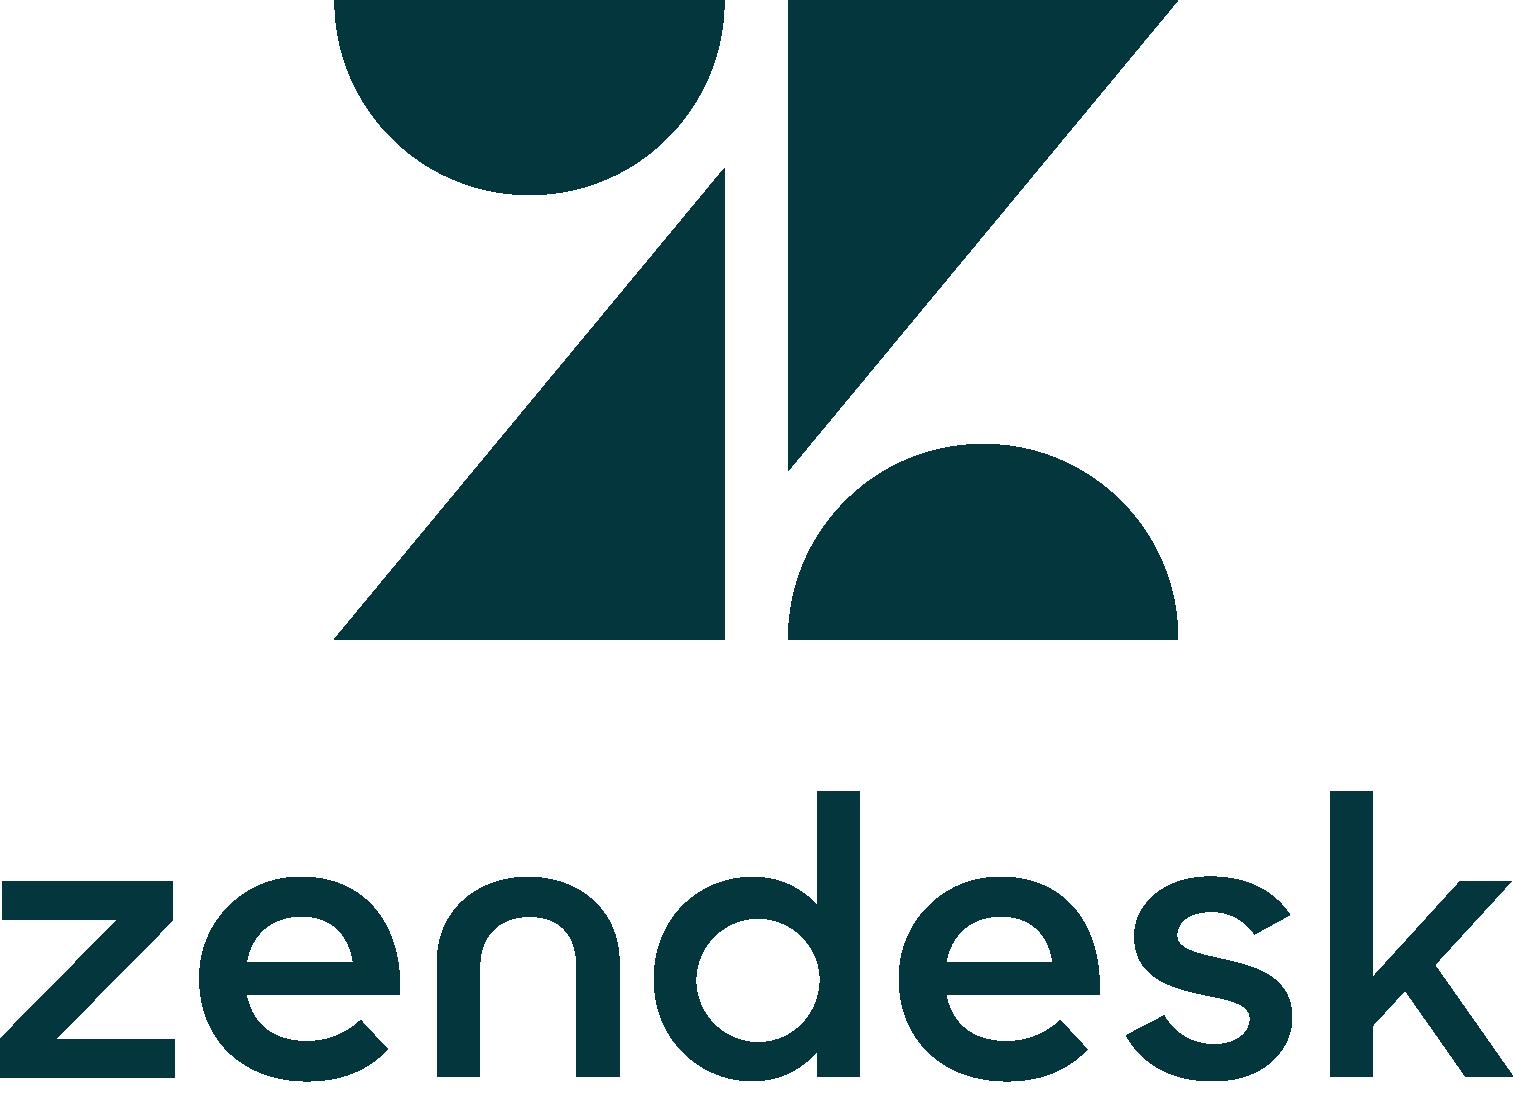 Zendesk core logo (1)